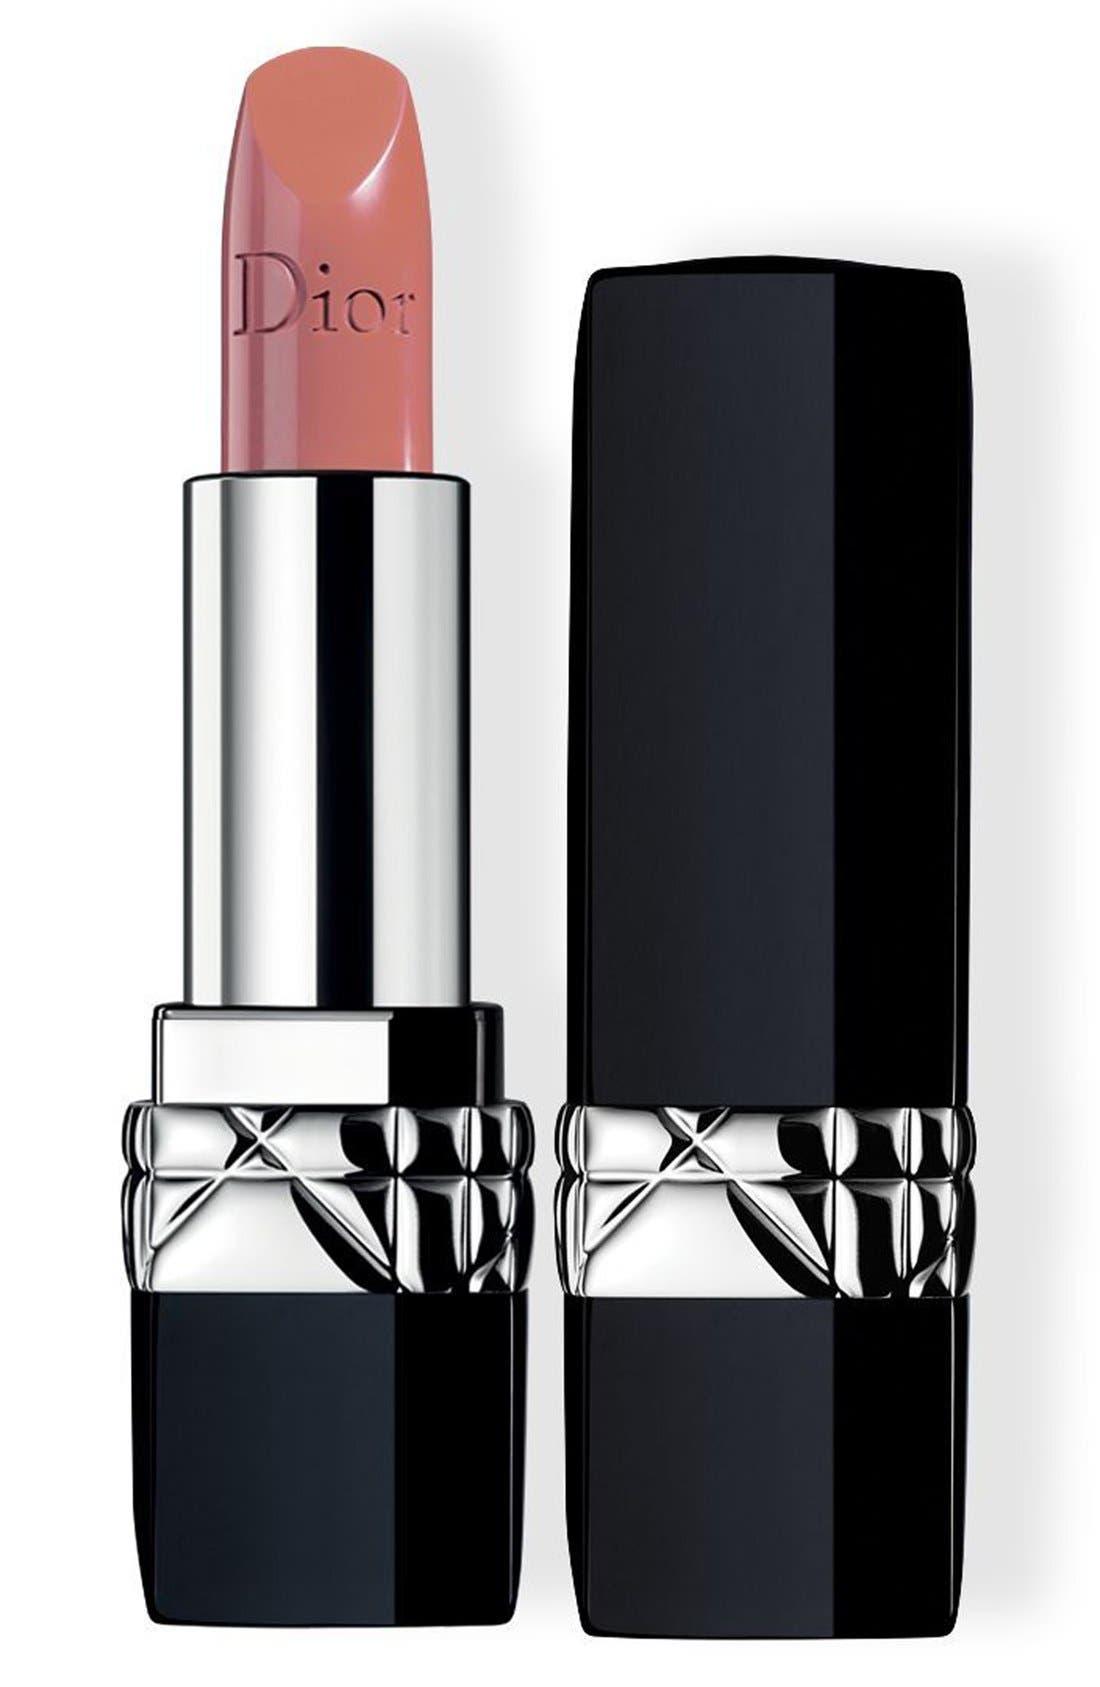 Dior Couture Color Rouge Dior Lipstick - 219 Rose Montaigne